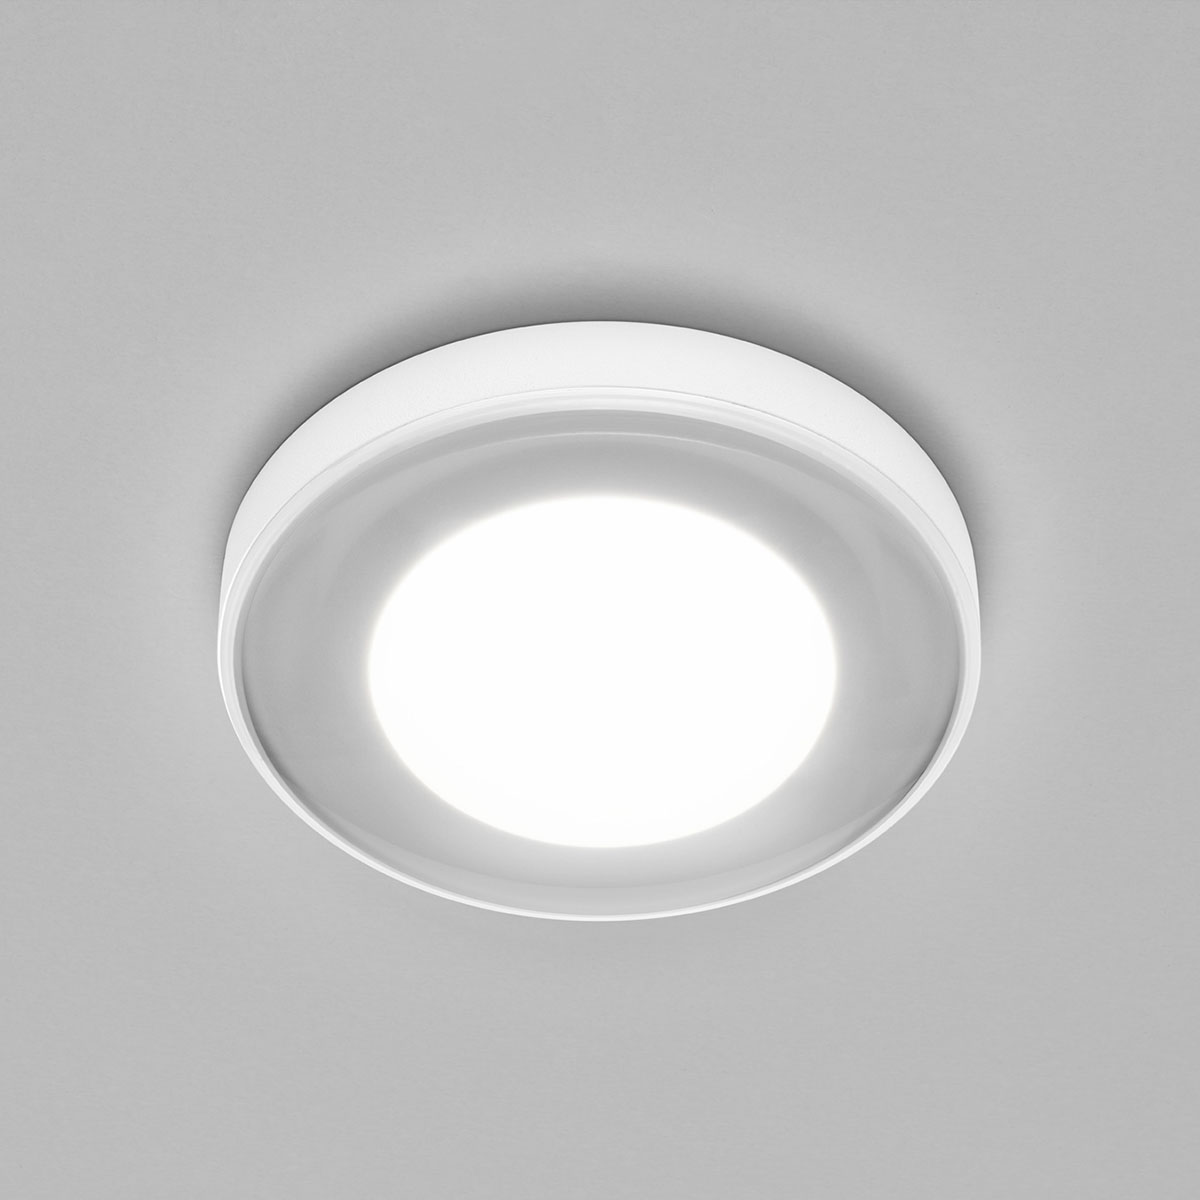 Helestra Lug LED Deckeneinbaustrahler